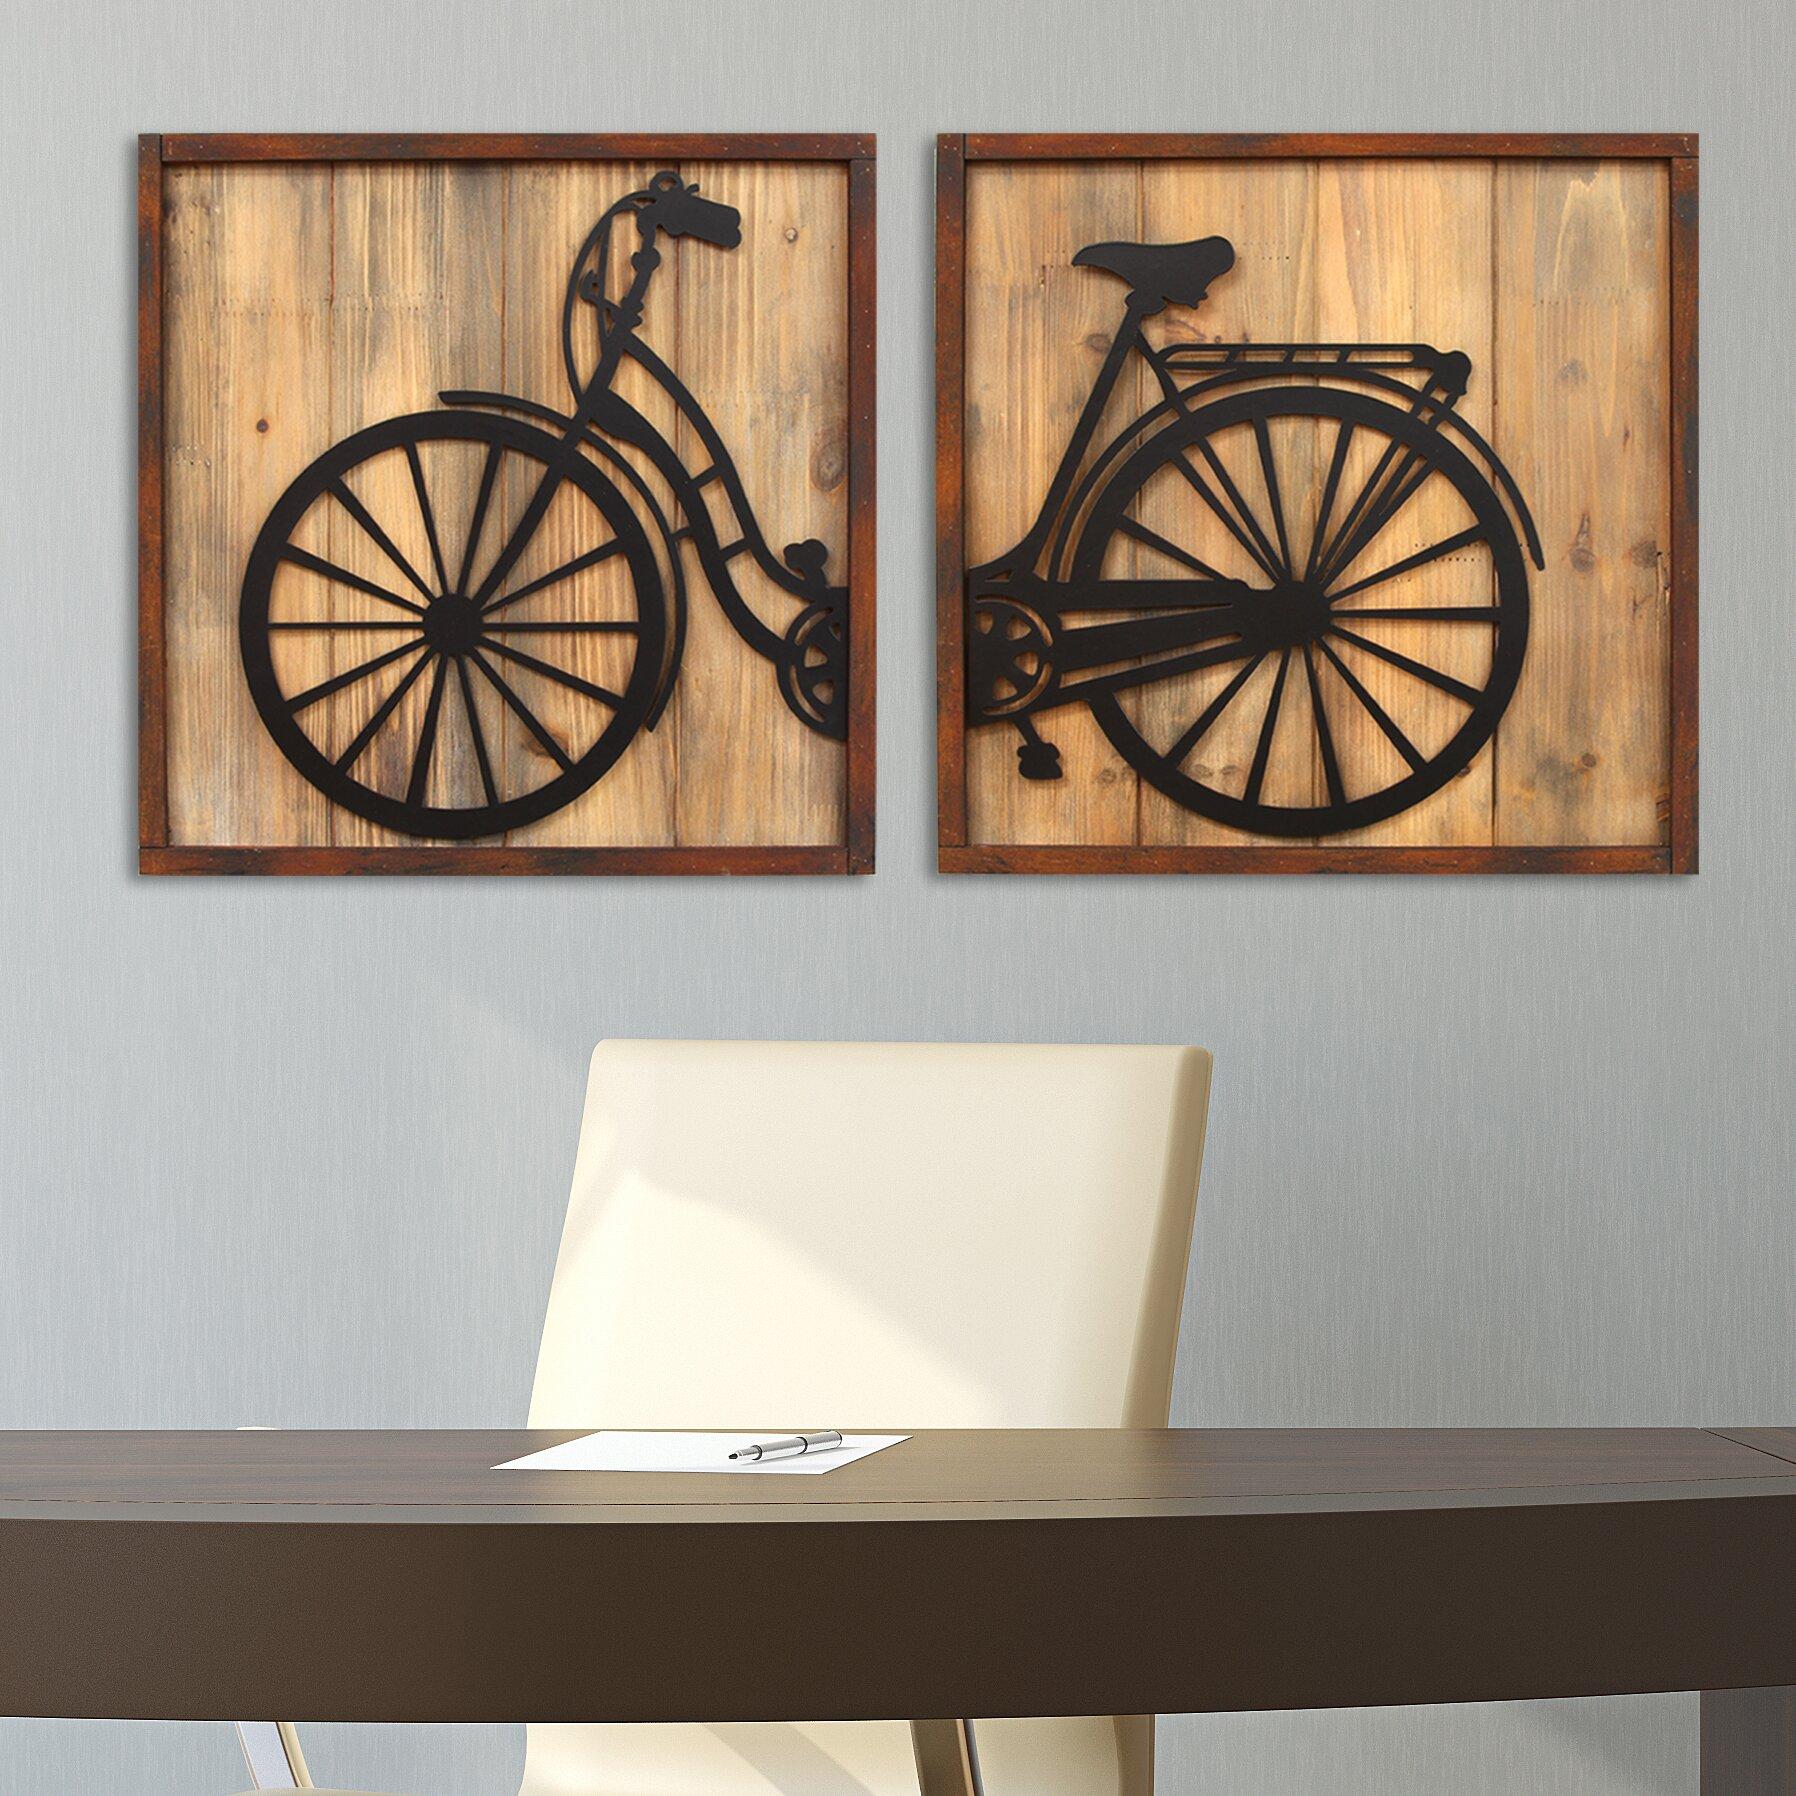 Retro Kitchen Wall Decor Stratton Home Decor 2 Piece Retro Bicycle Panels Wall Dccor Set